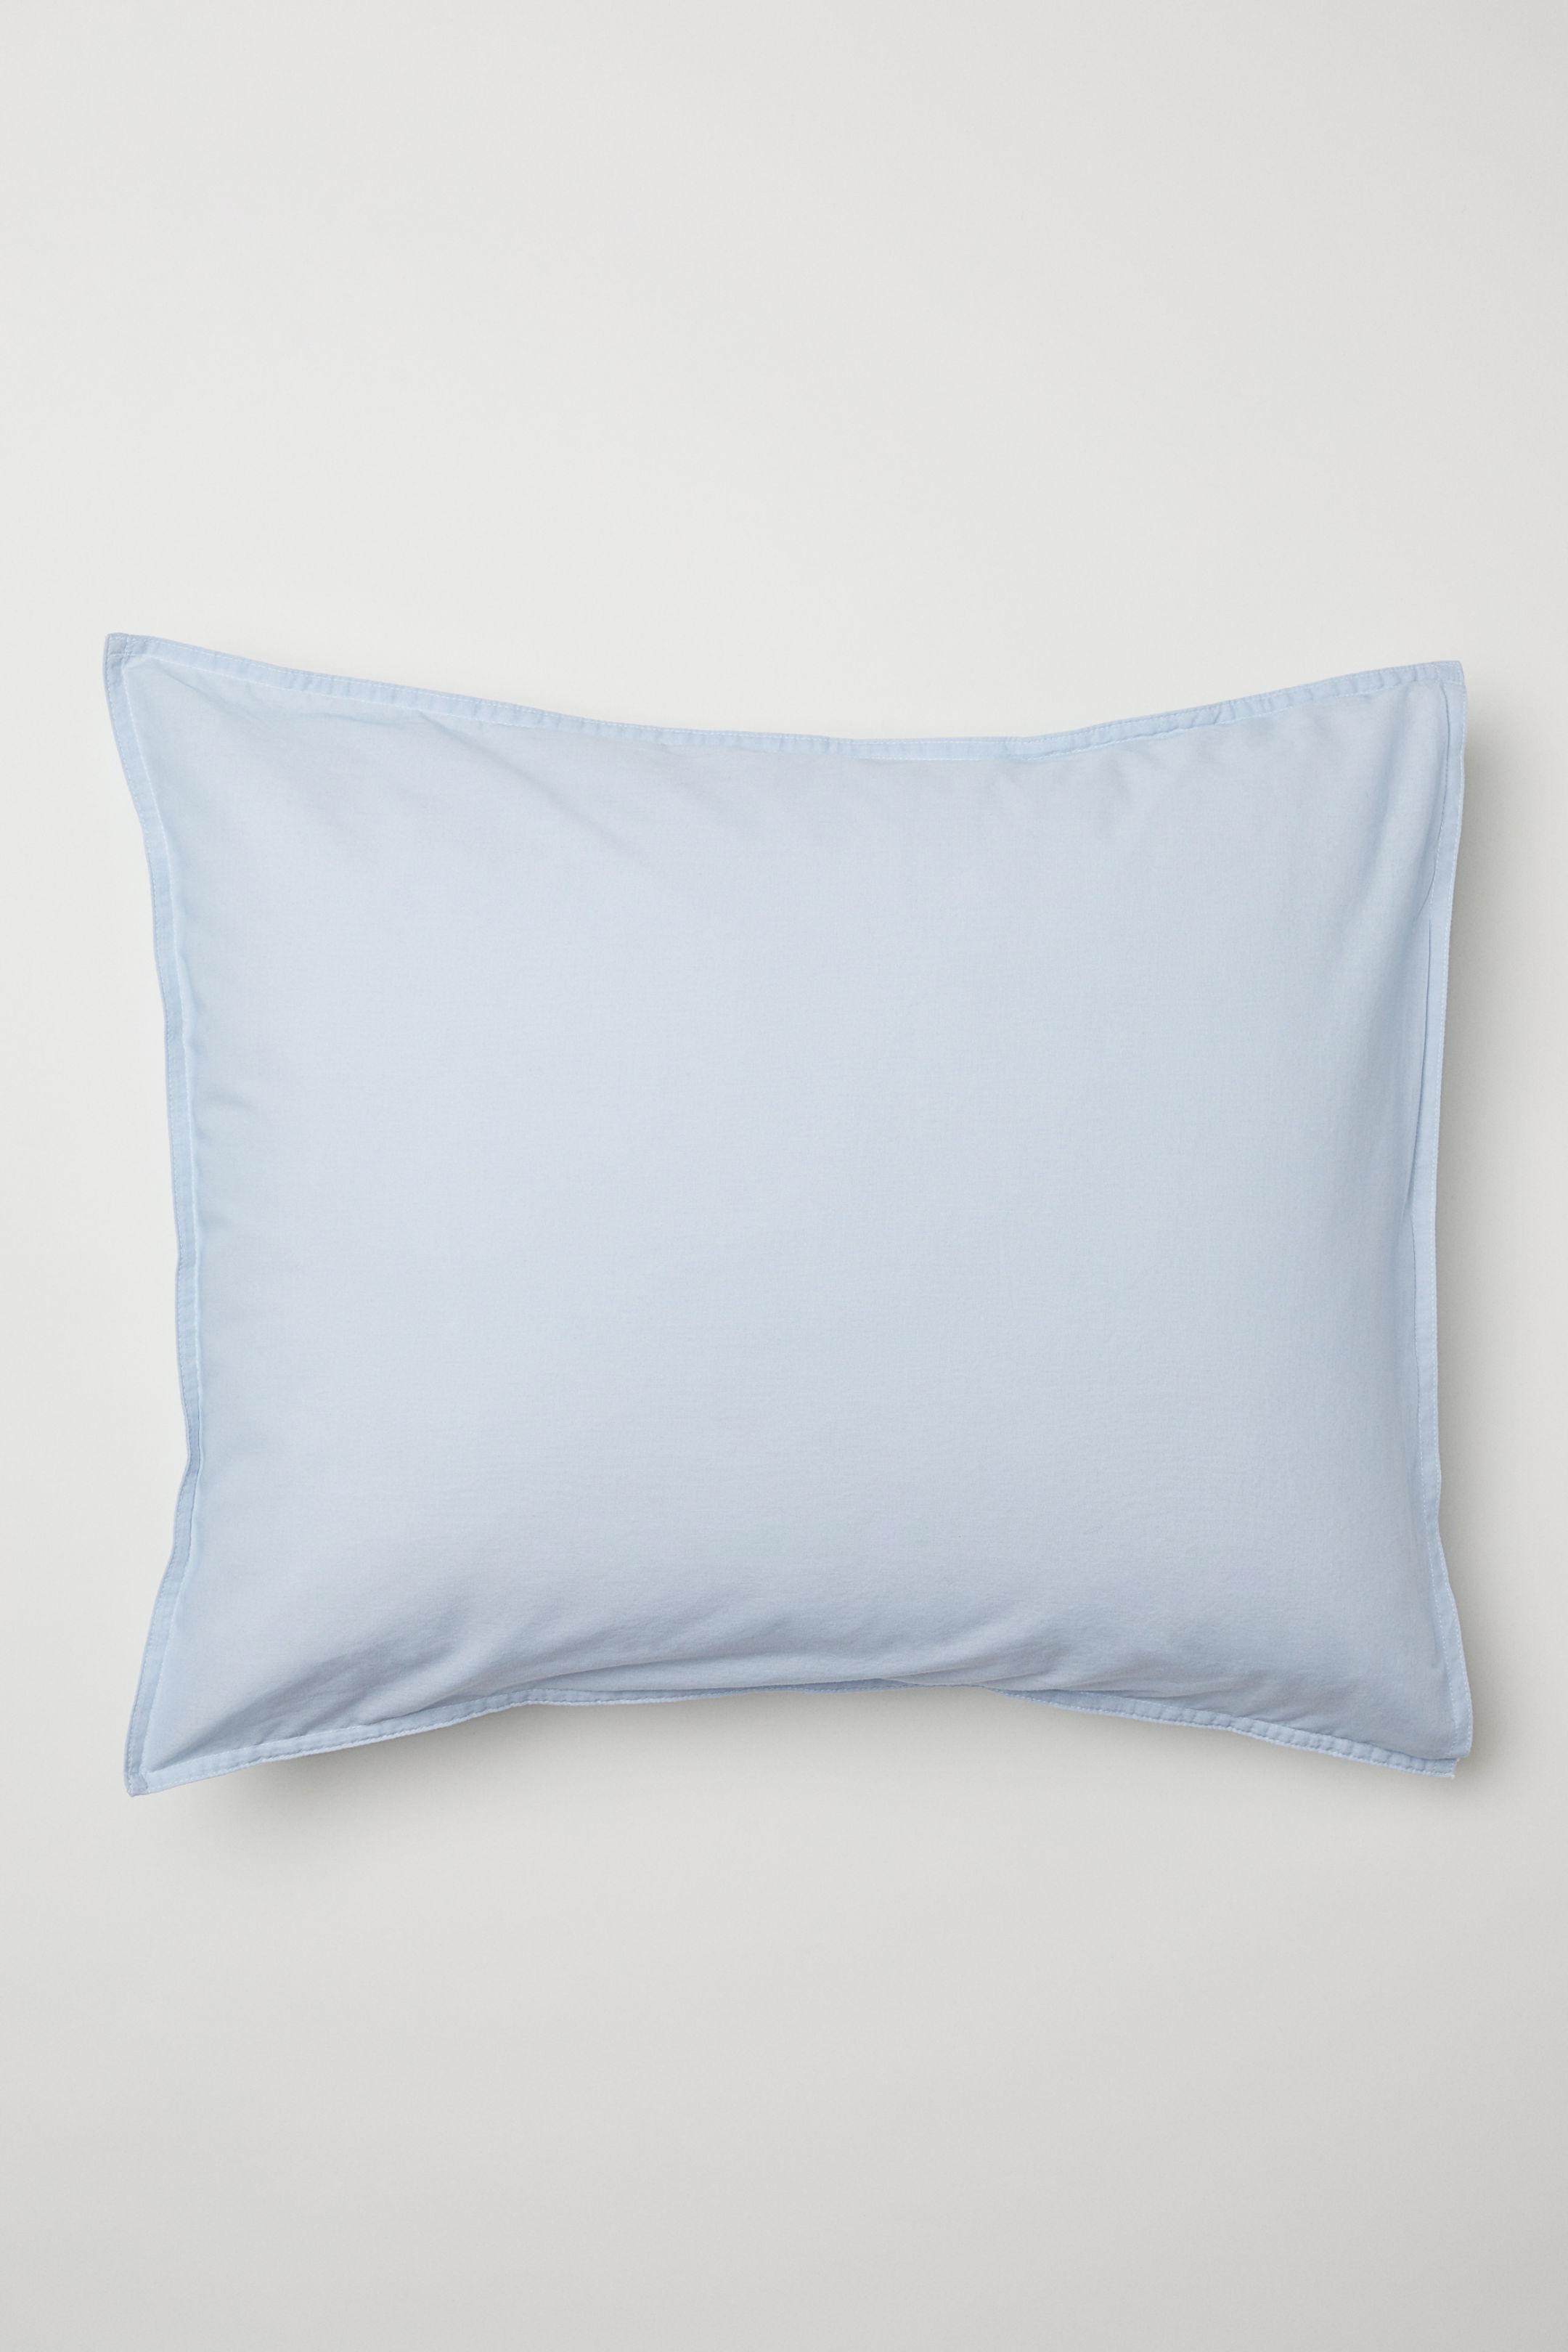 washed cotton pillow case blue